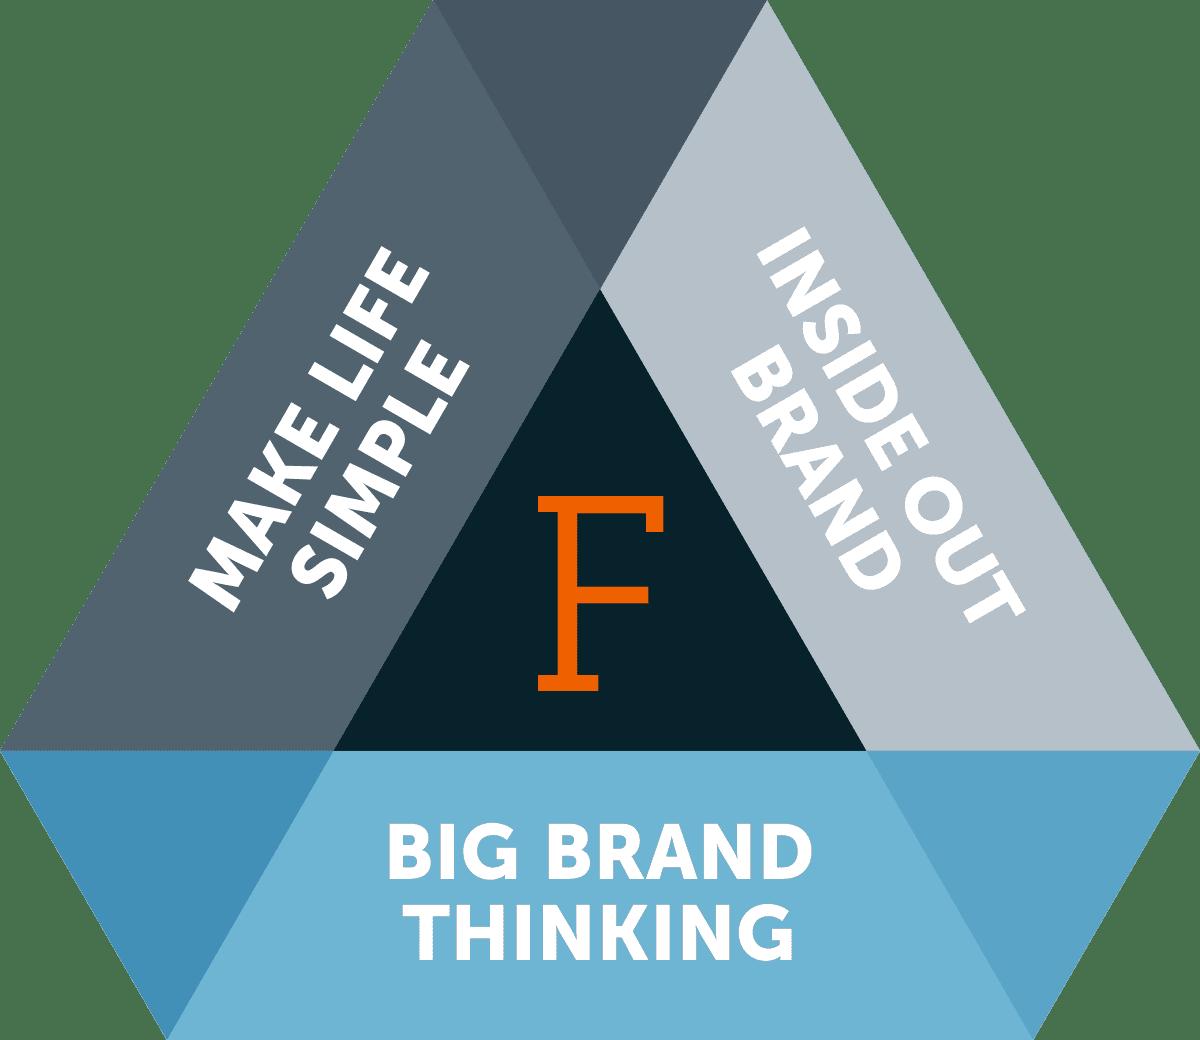 Firebrand 3 principles